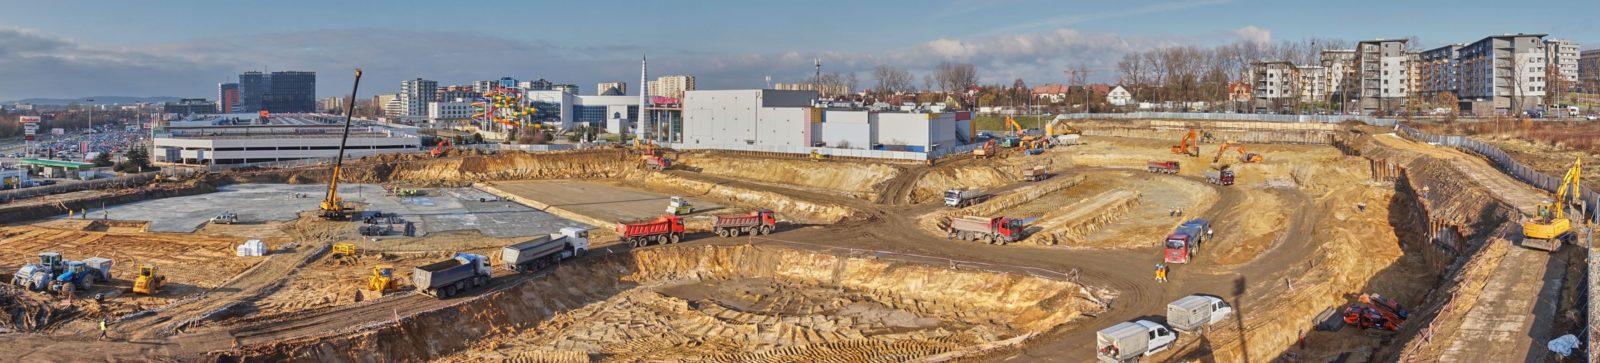 panorama na plac budowy galerii olsza mall